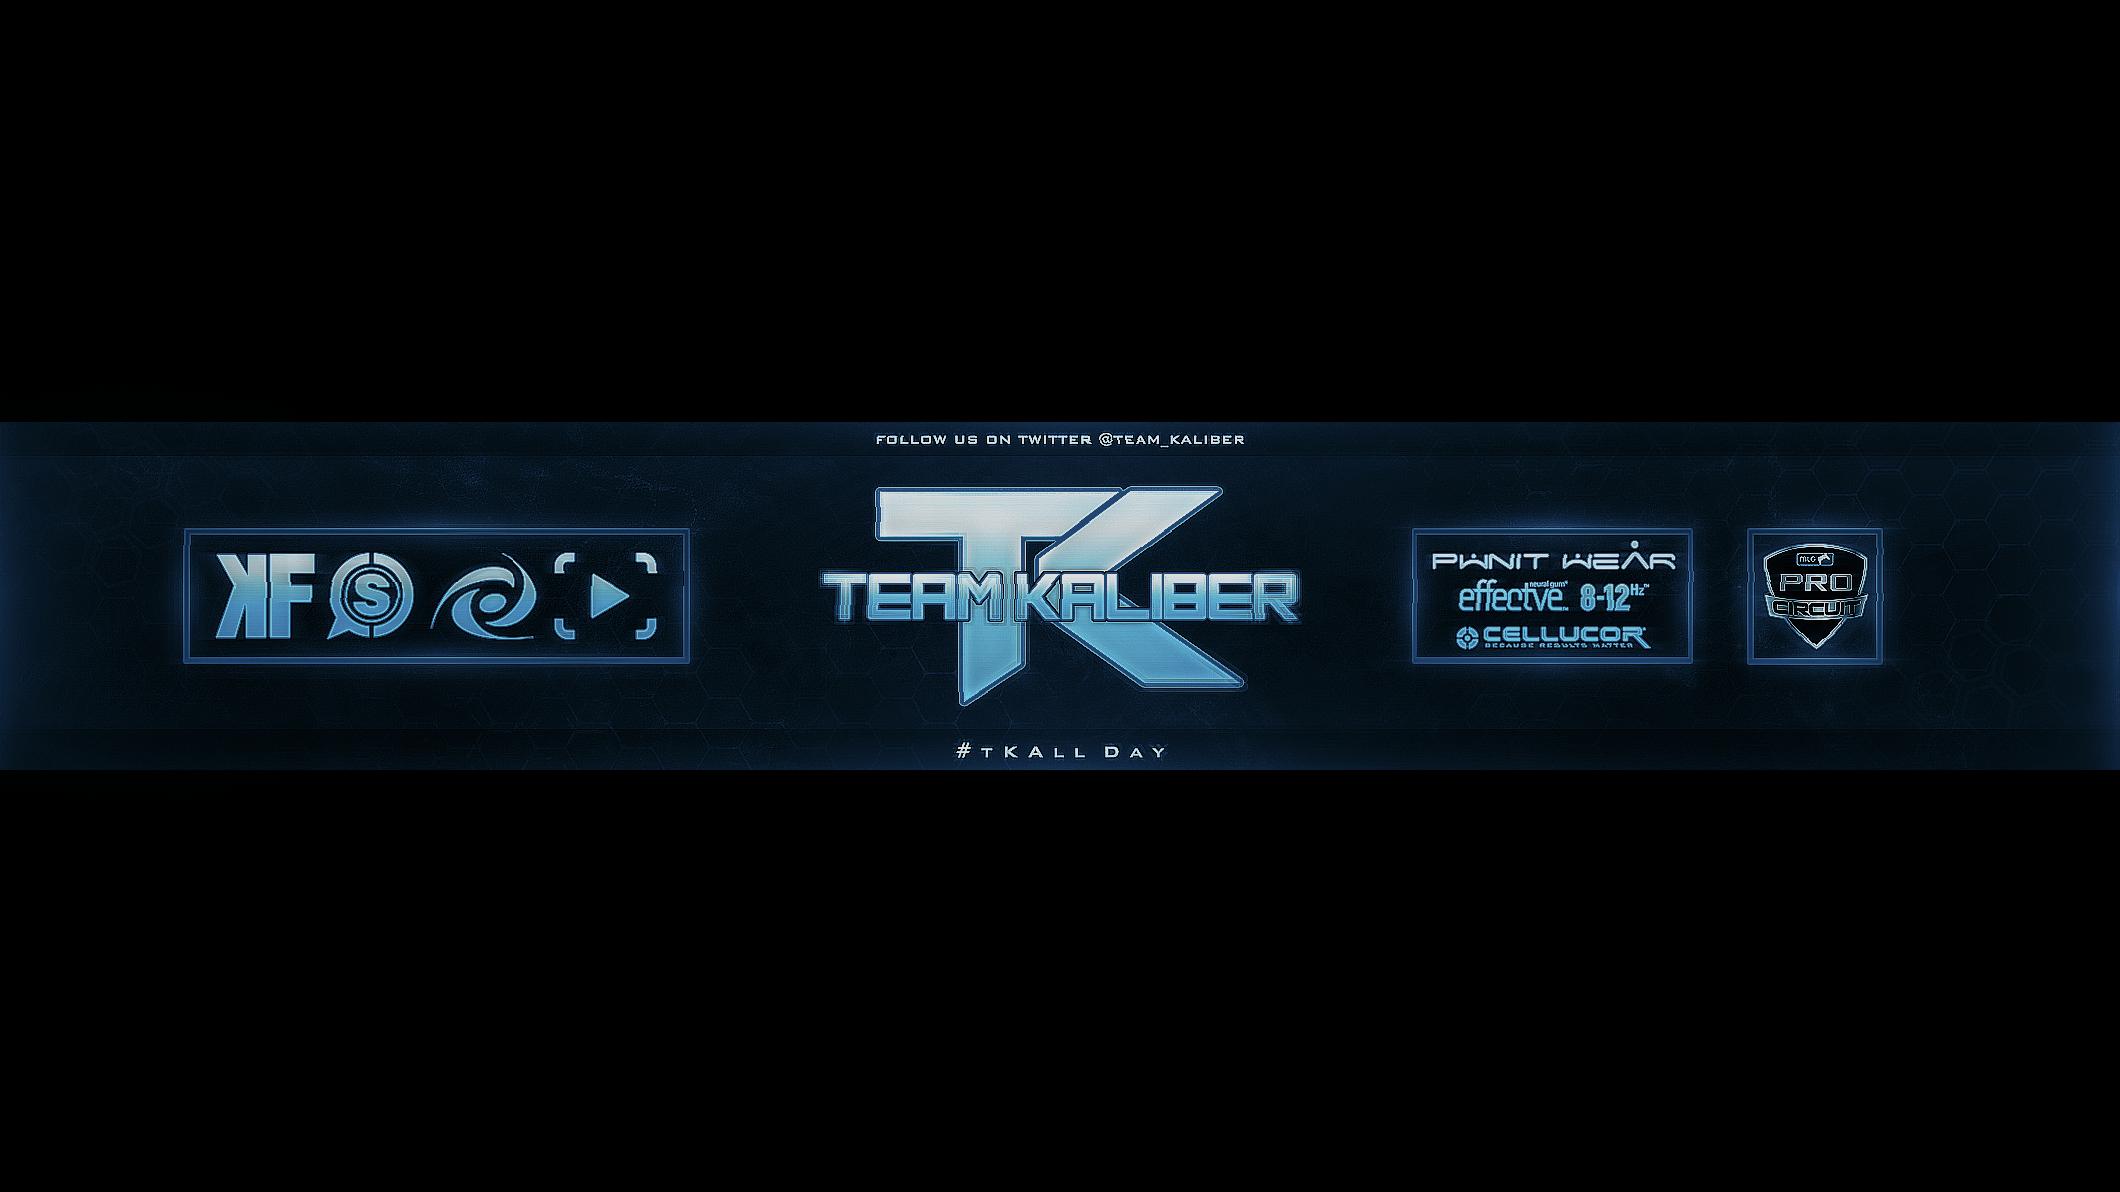 Team Kaliber YouTube Banner #tKAllDay by TravelArts on ...